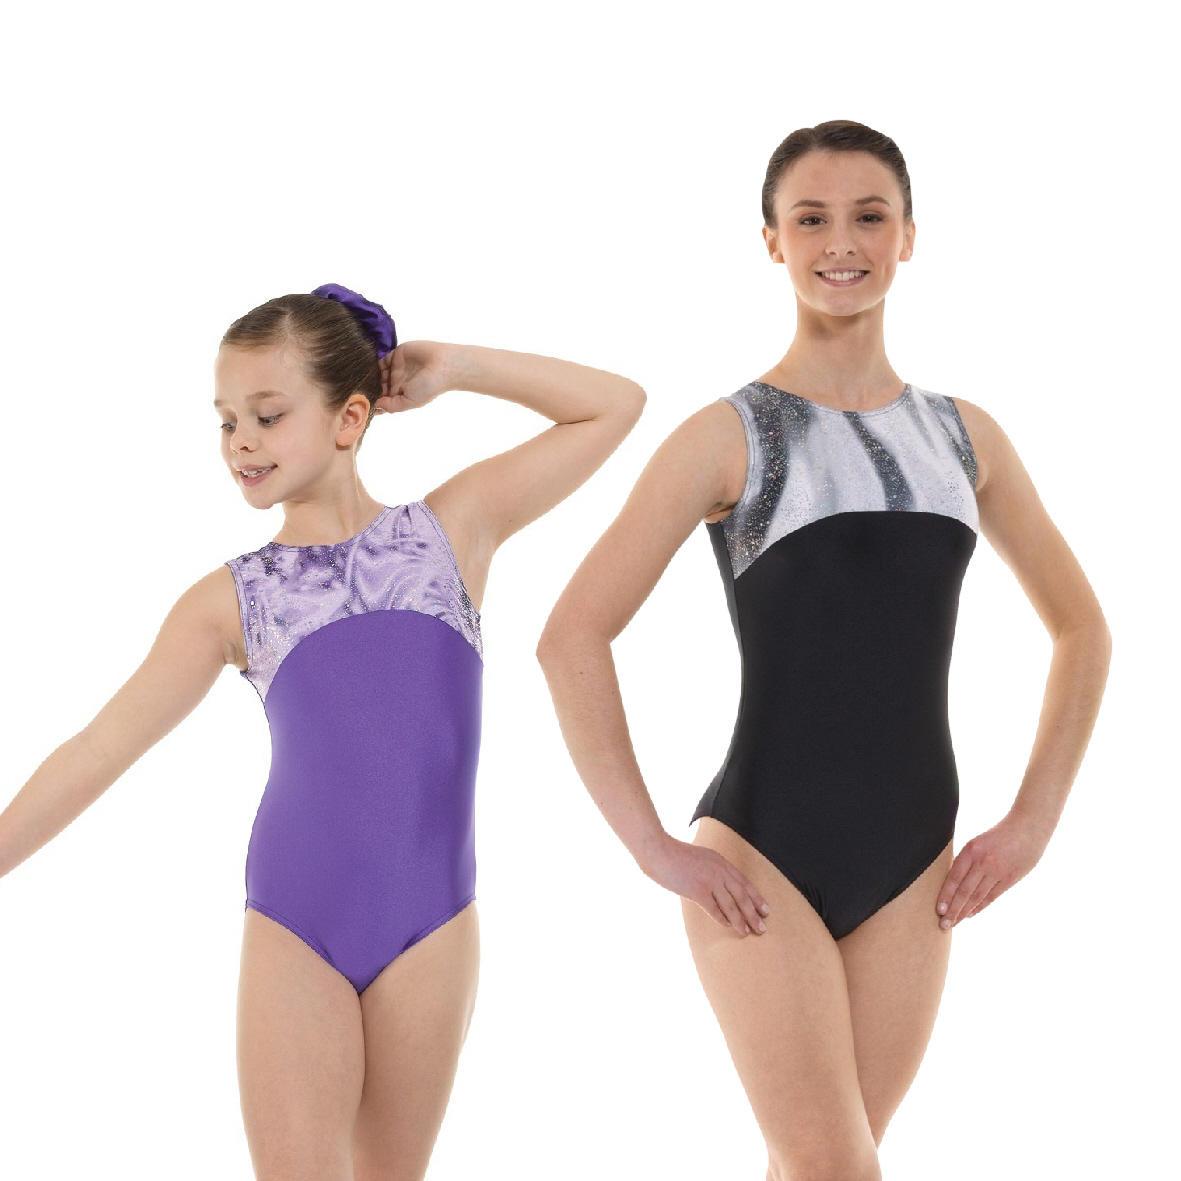 gymnastics leotards for girls amp women move dancewear - HD1181×1181